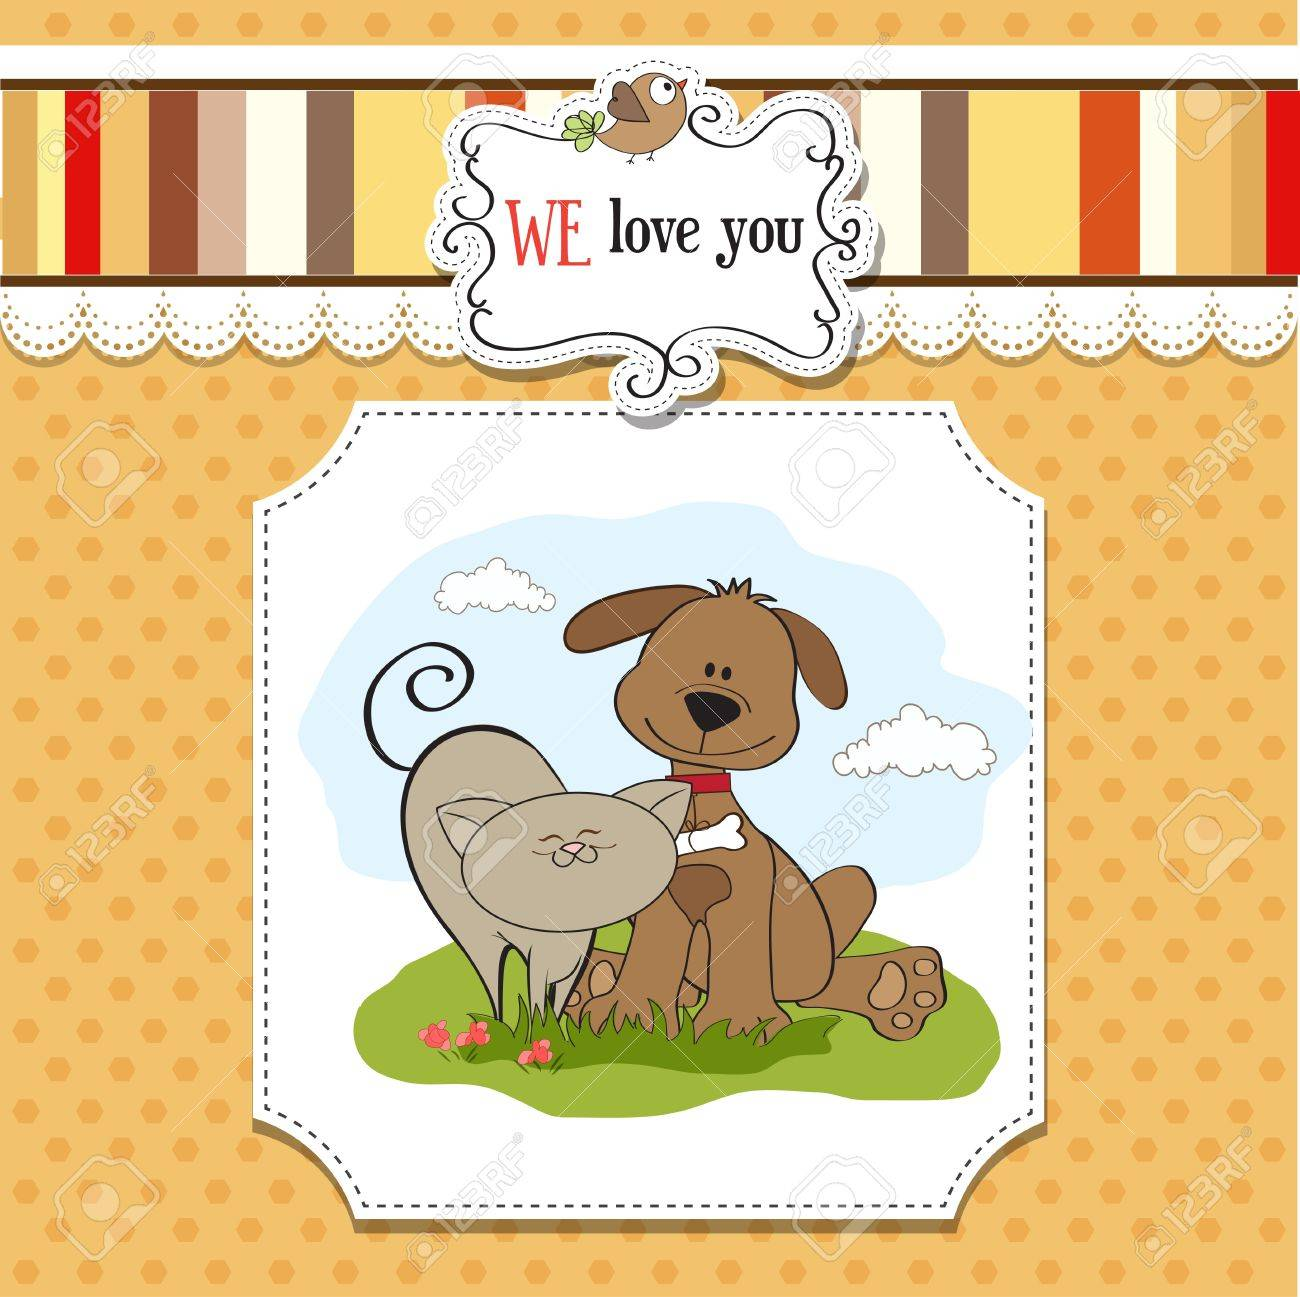 dog   cat s friendship Stock Vector - 13543080